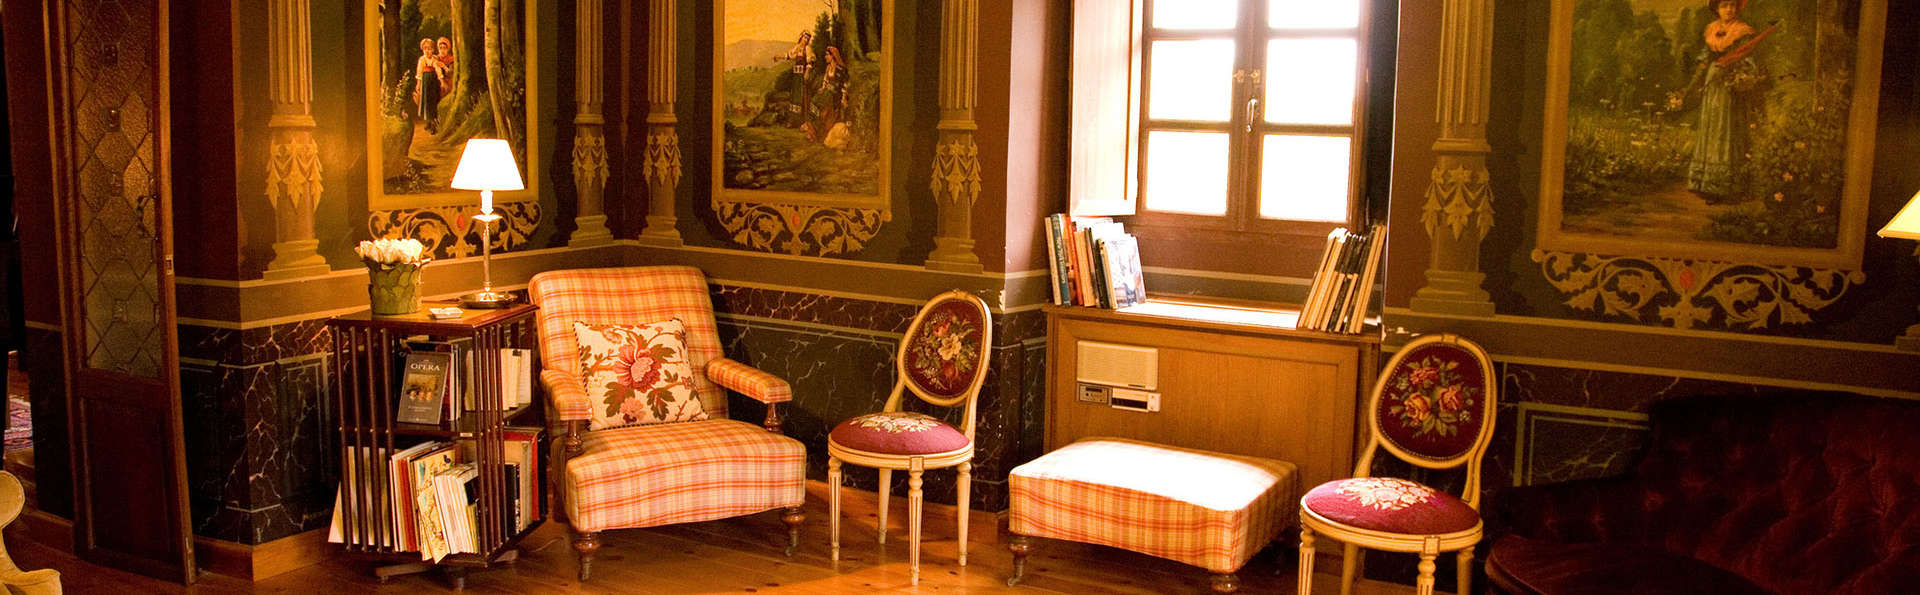 Hotel Palacio Torre de Ruesga - Edit_Lougne.jpg